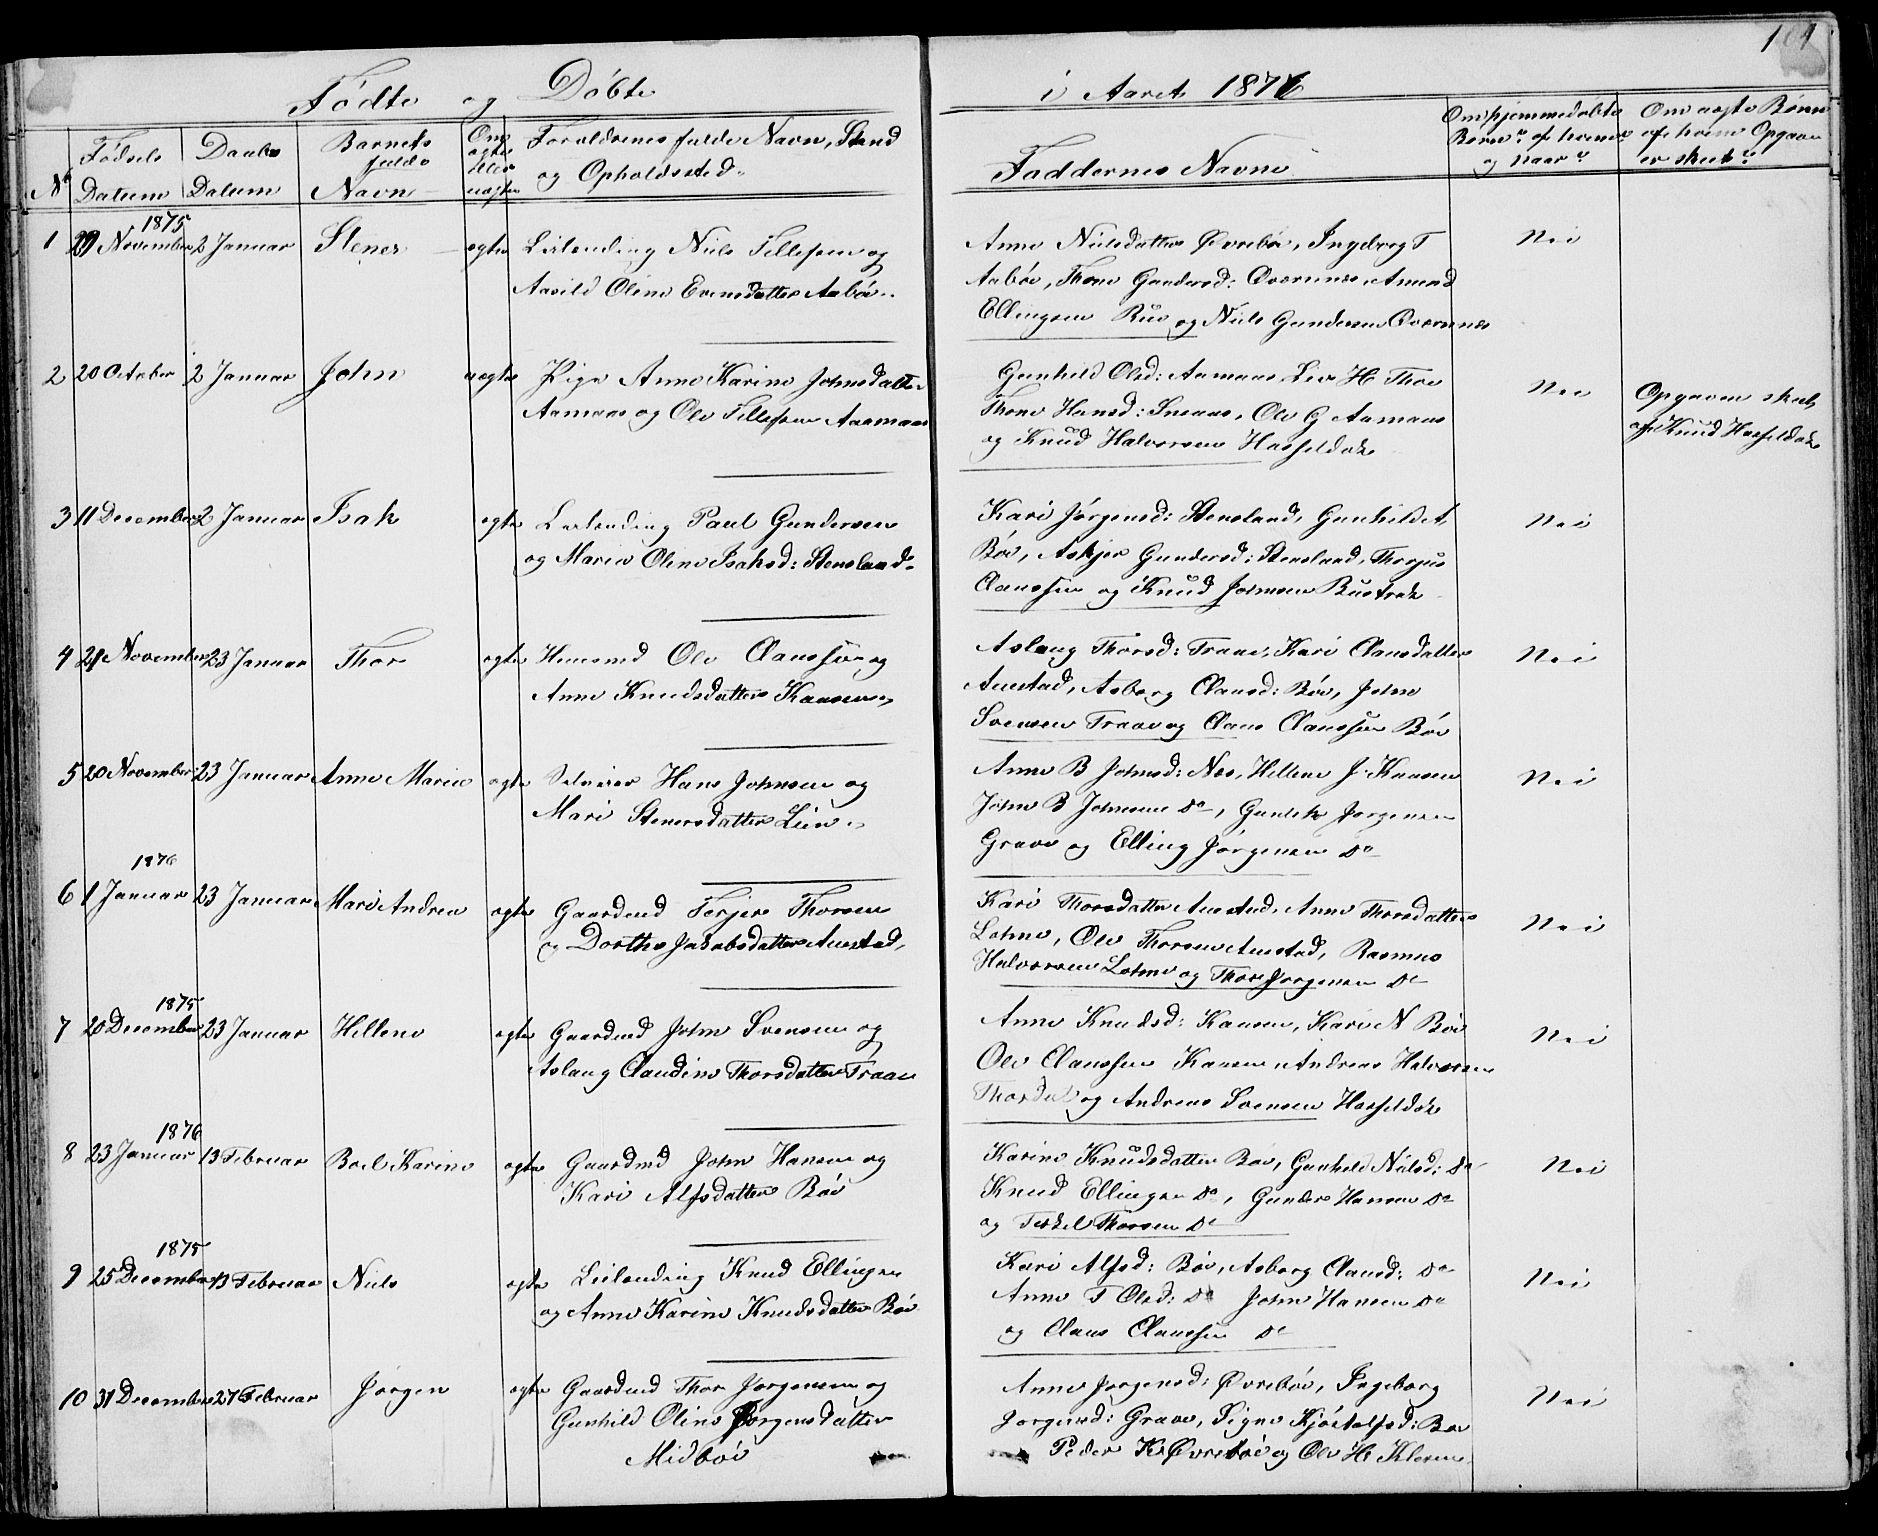 SAKO, Drangedal kirkebøker, G/Gb/L0001: Klokkerbok nr. II 1, 1856-1894, s. 104